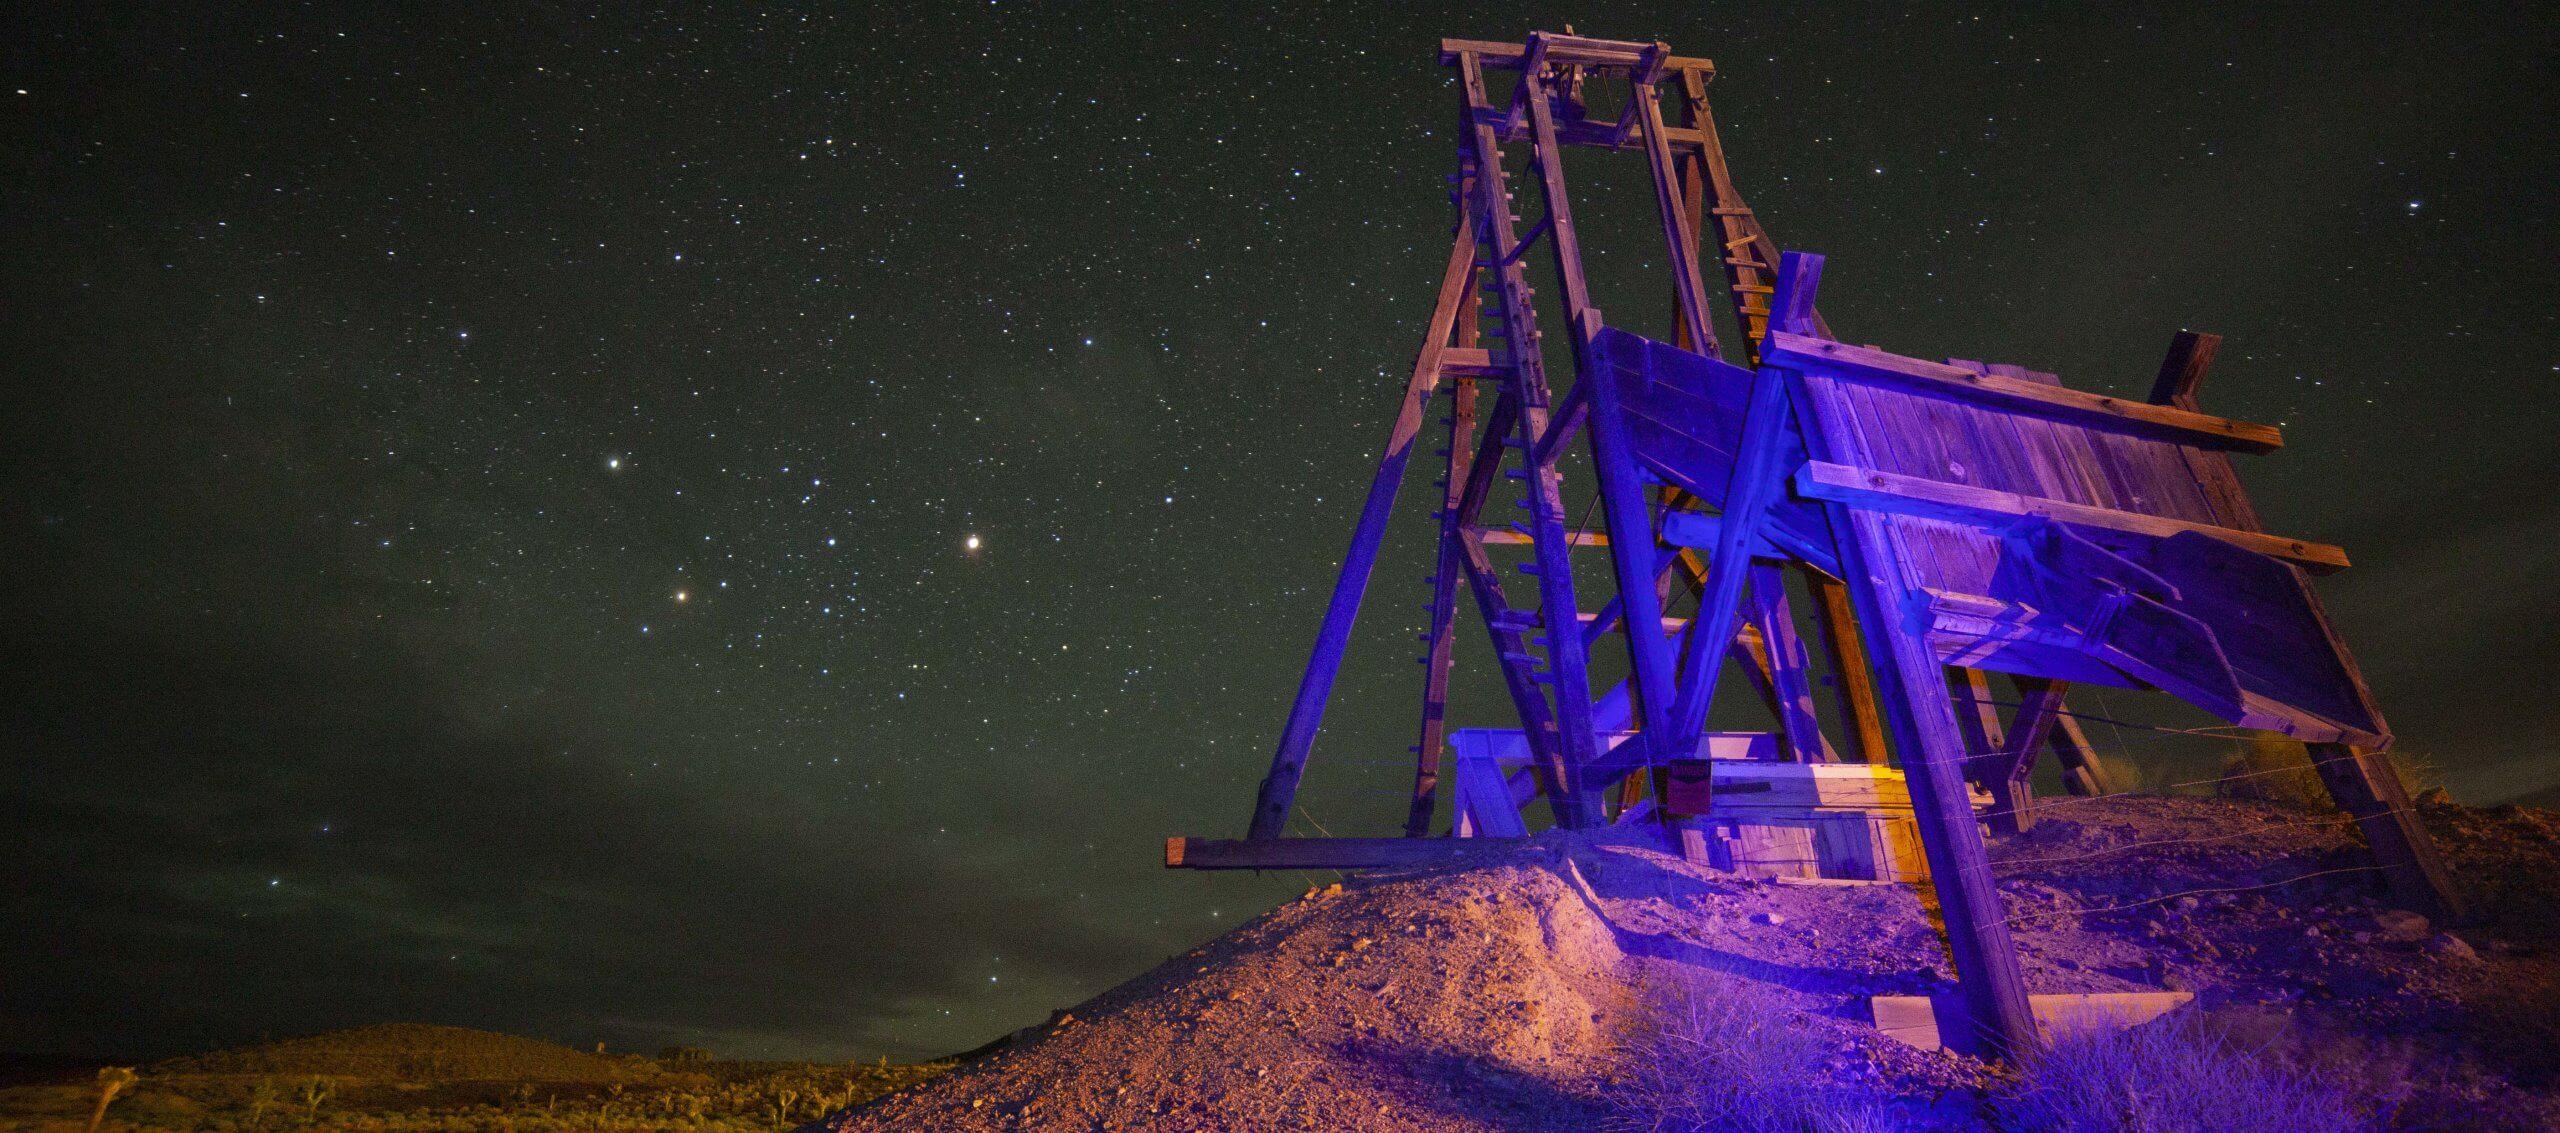 Nevada Stargazing, Nevada Inspiration, Trip Inspiration, Nevada Trip Inspiration, Gold Point Ghost Town